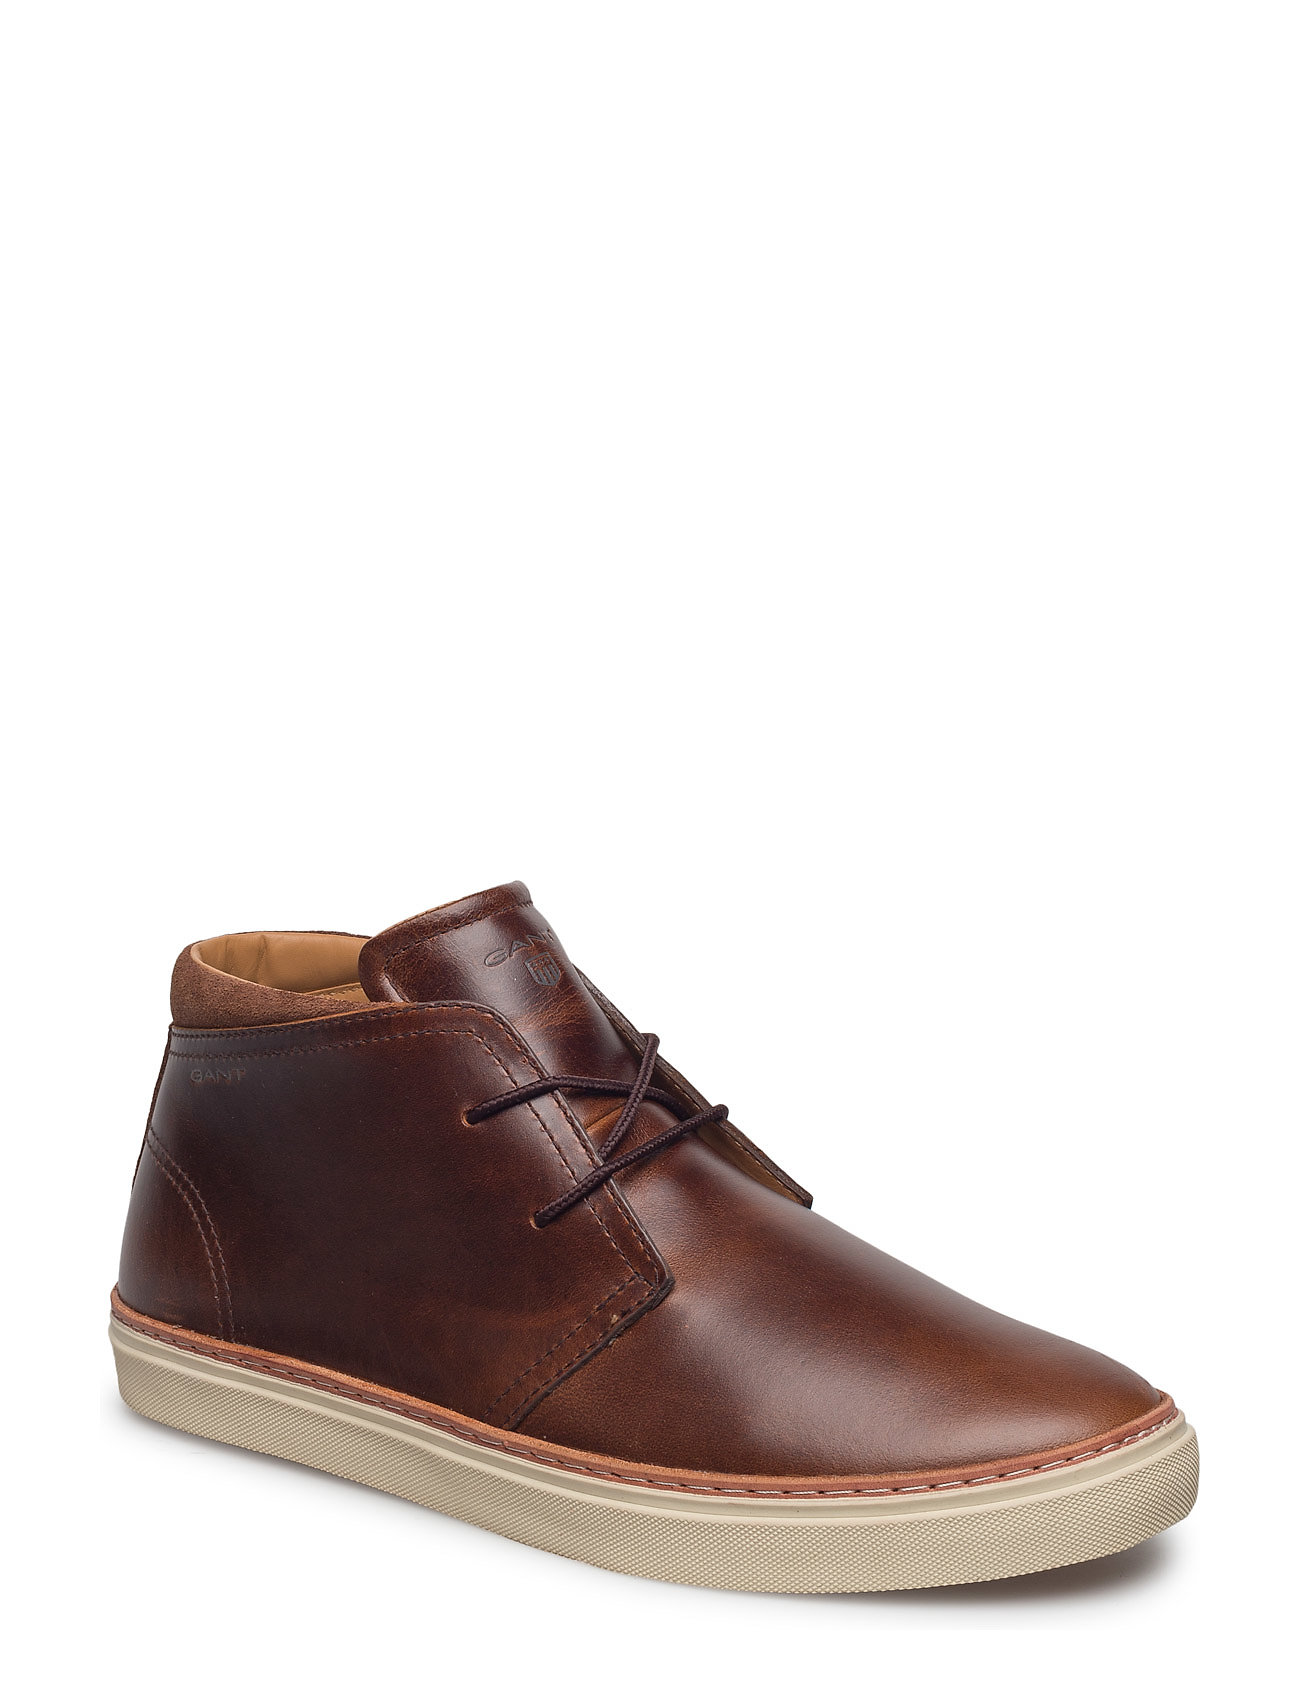 - Bari Mid Lace Boot GANT Shoes